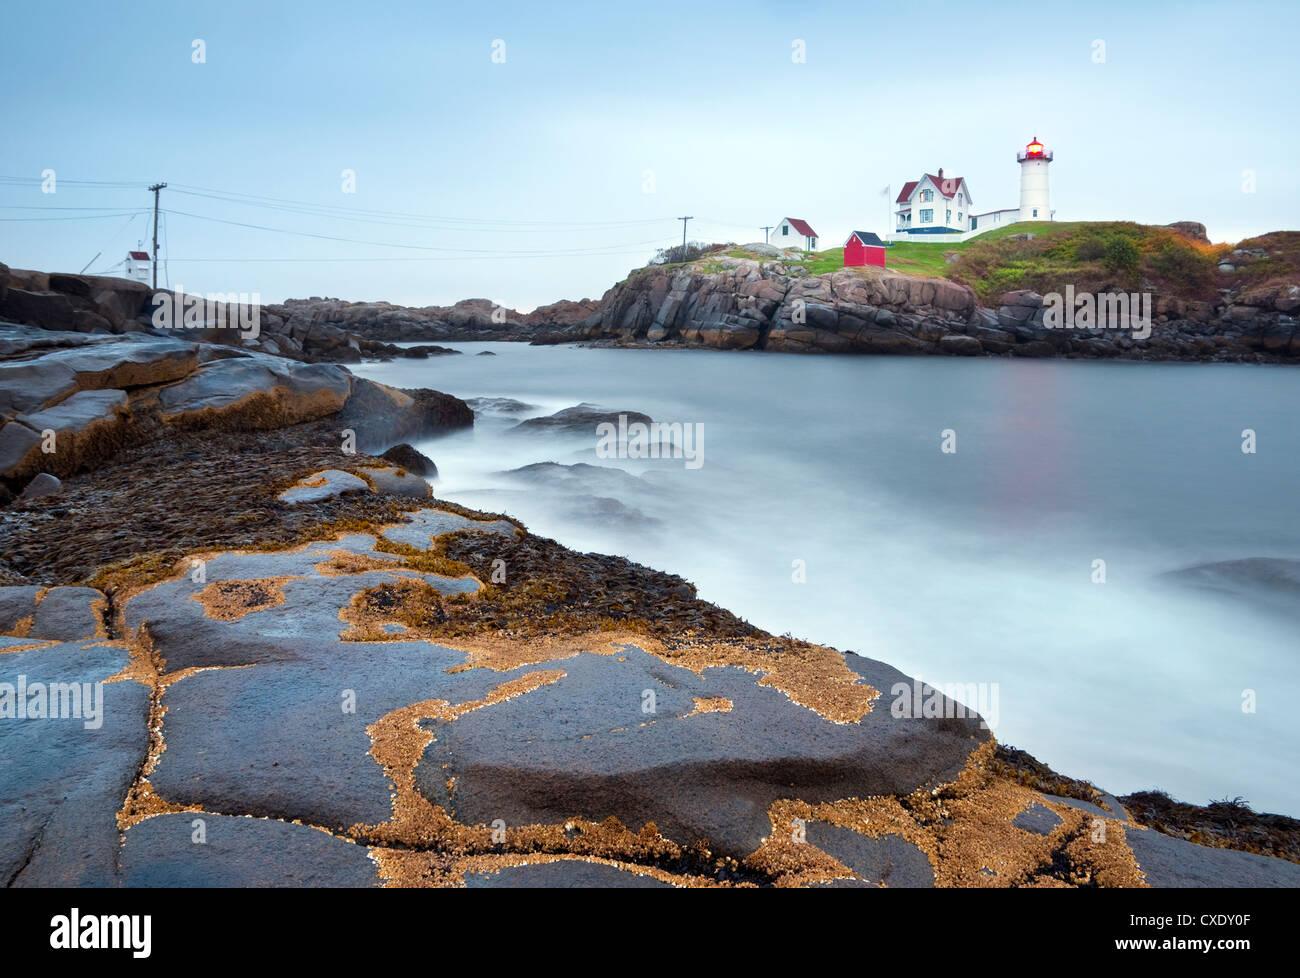 Cape Neddick (The Nubble) Lighthouse, Cape Neddick, Maine, New England, United States of America, North America - Stock Image